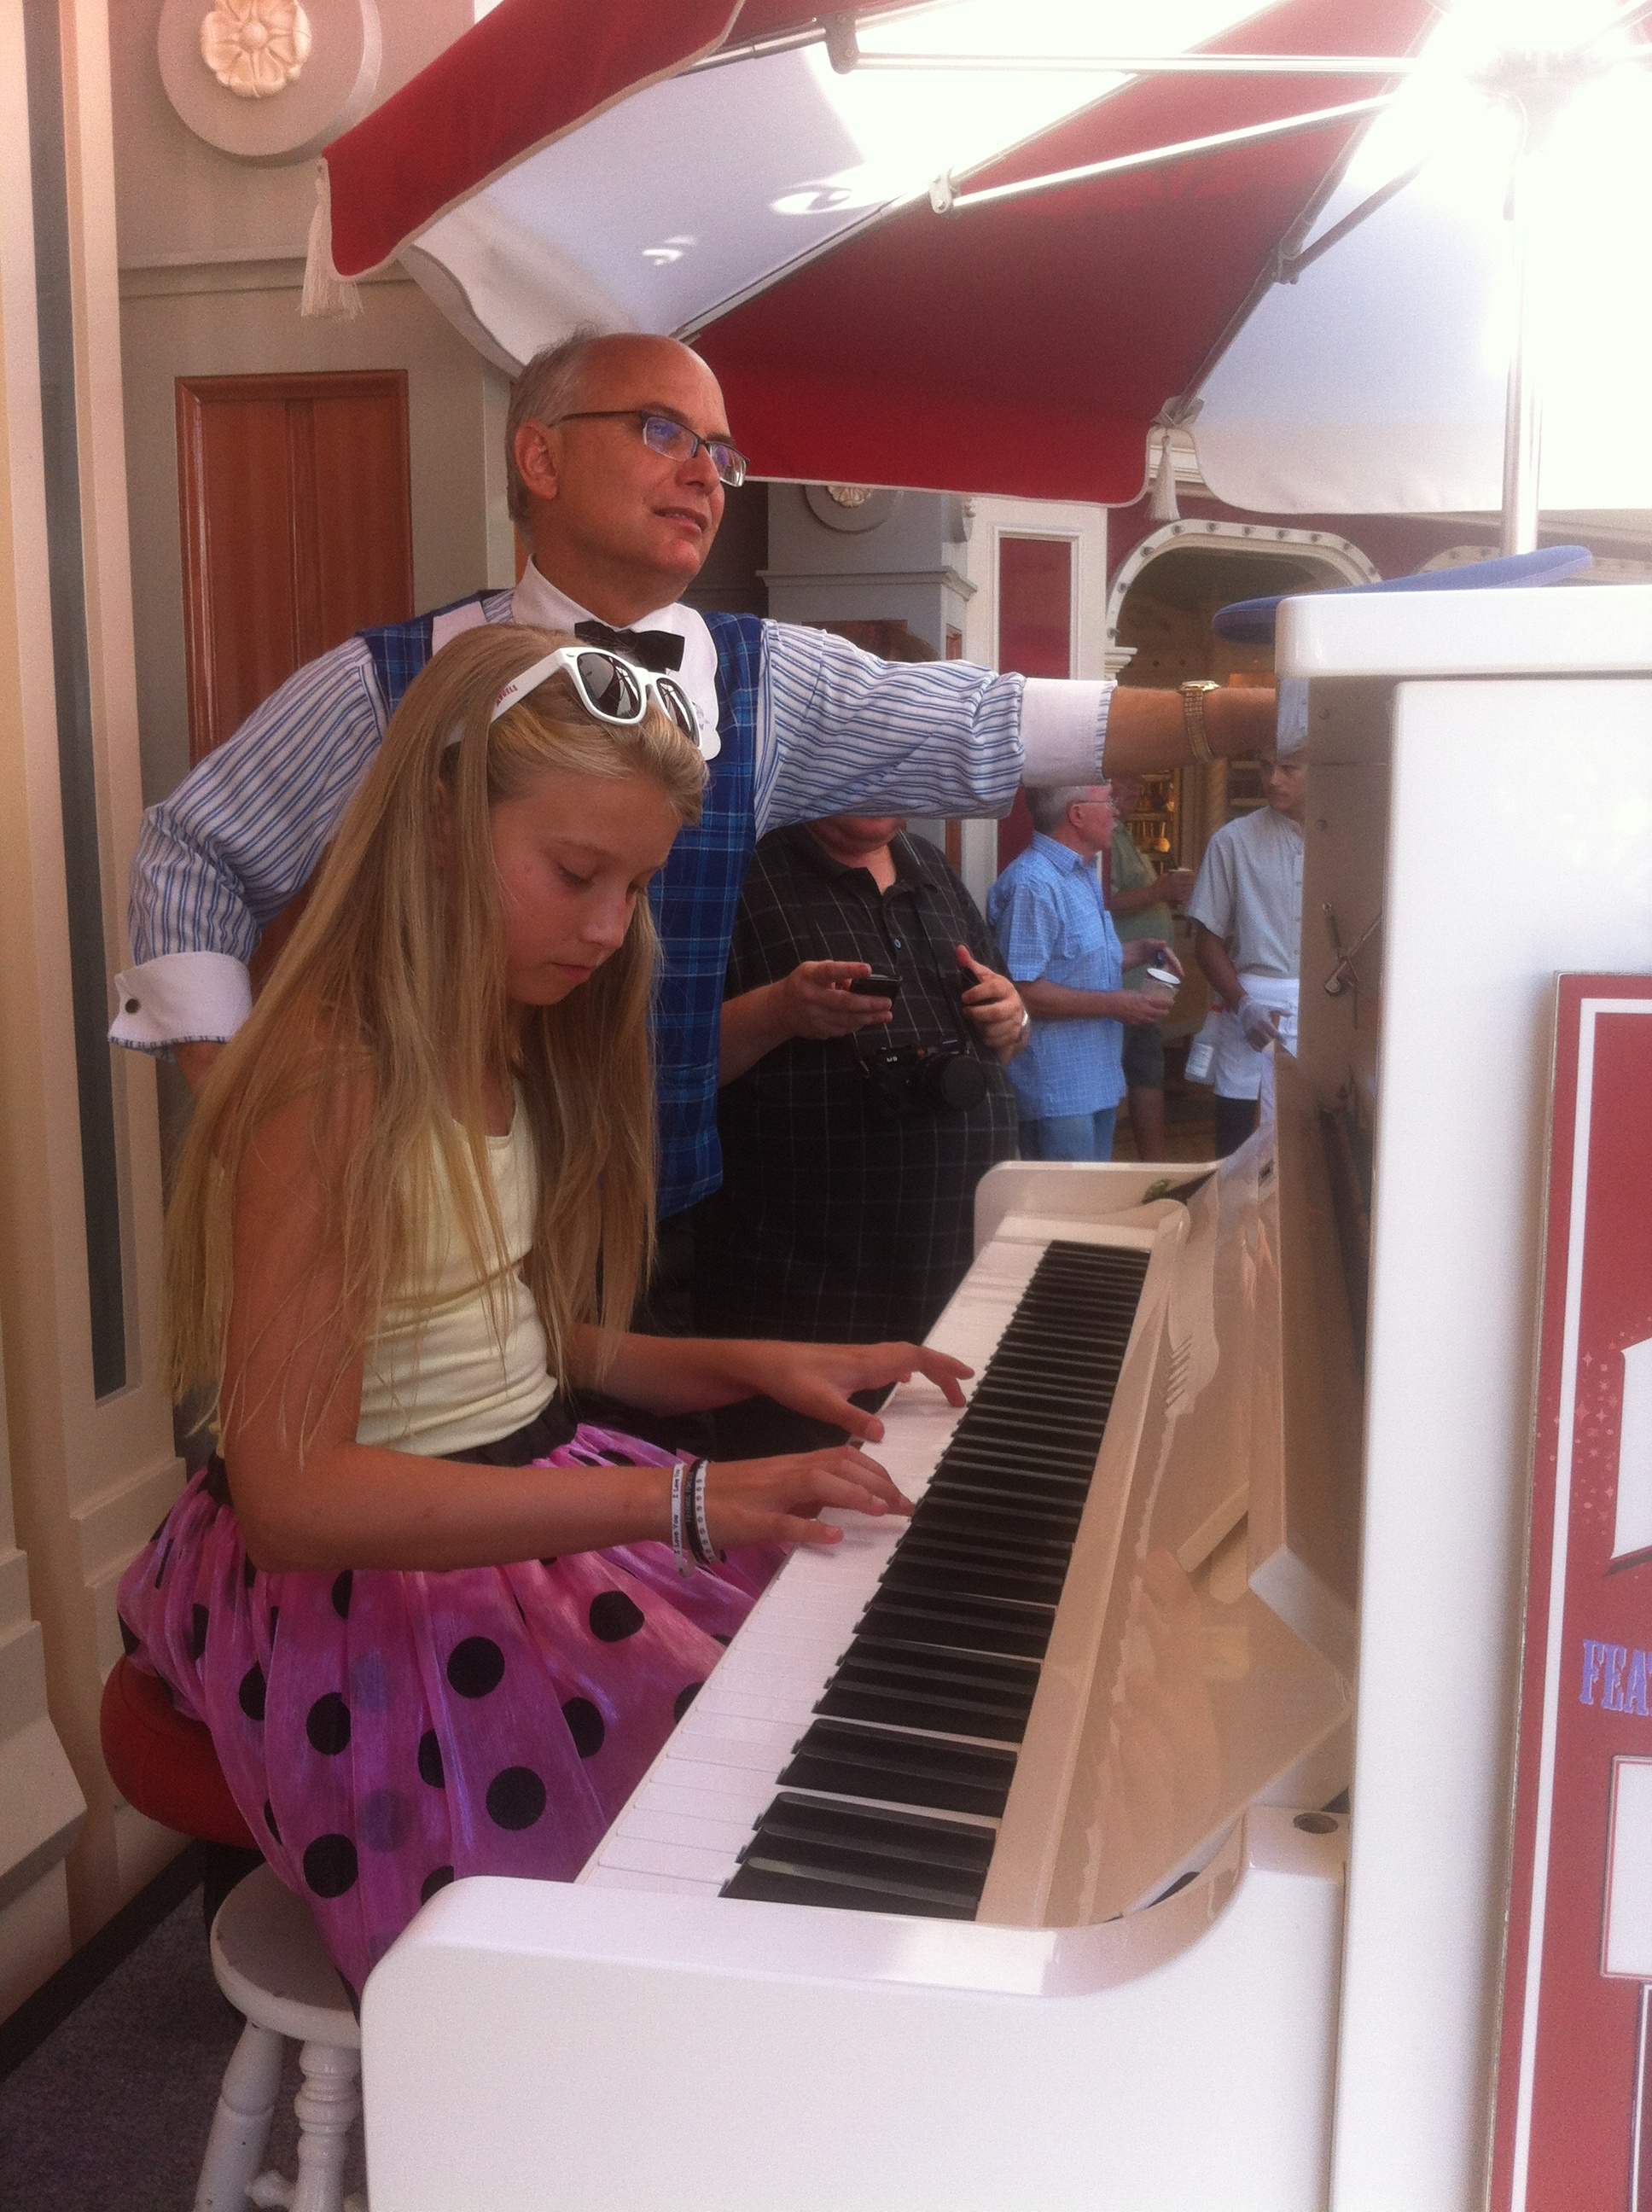 Piano Student at Disneyland